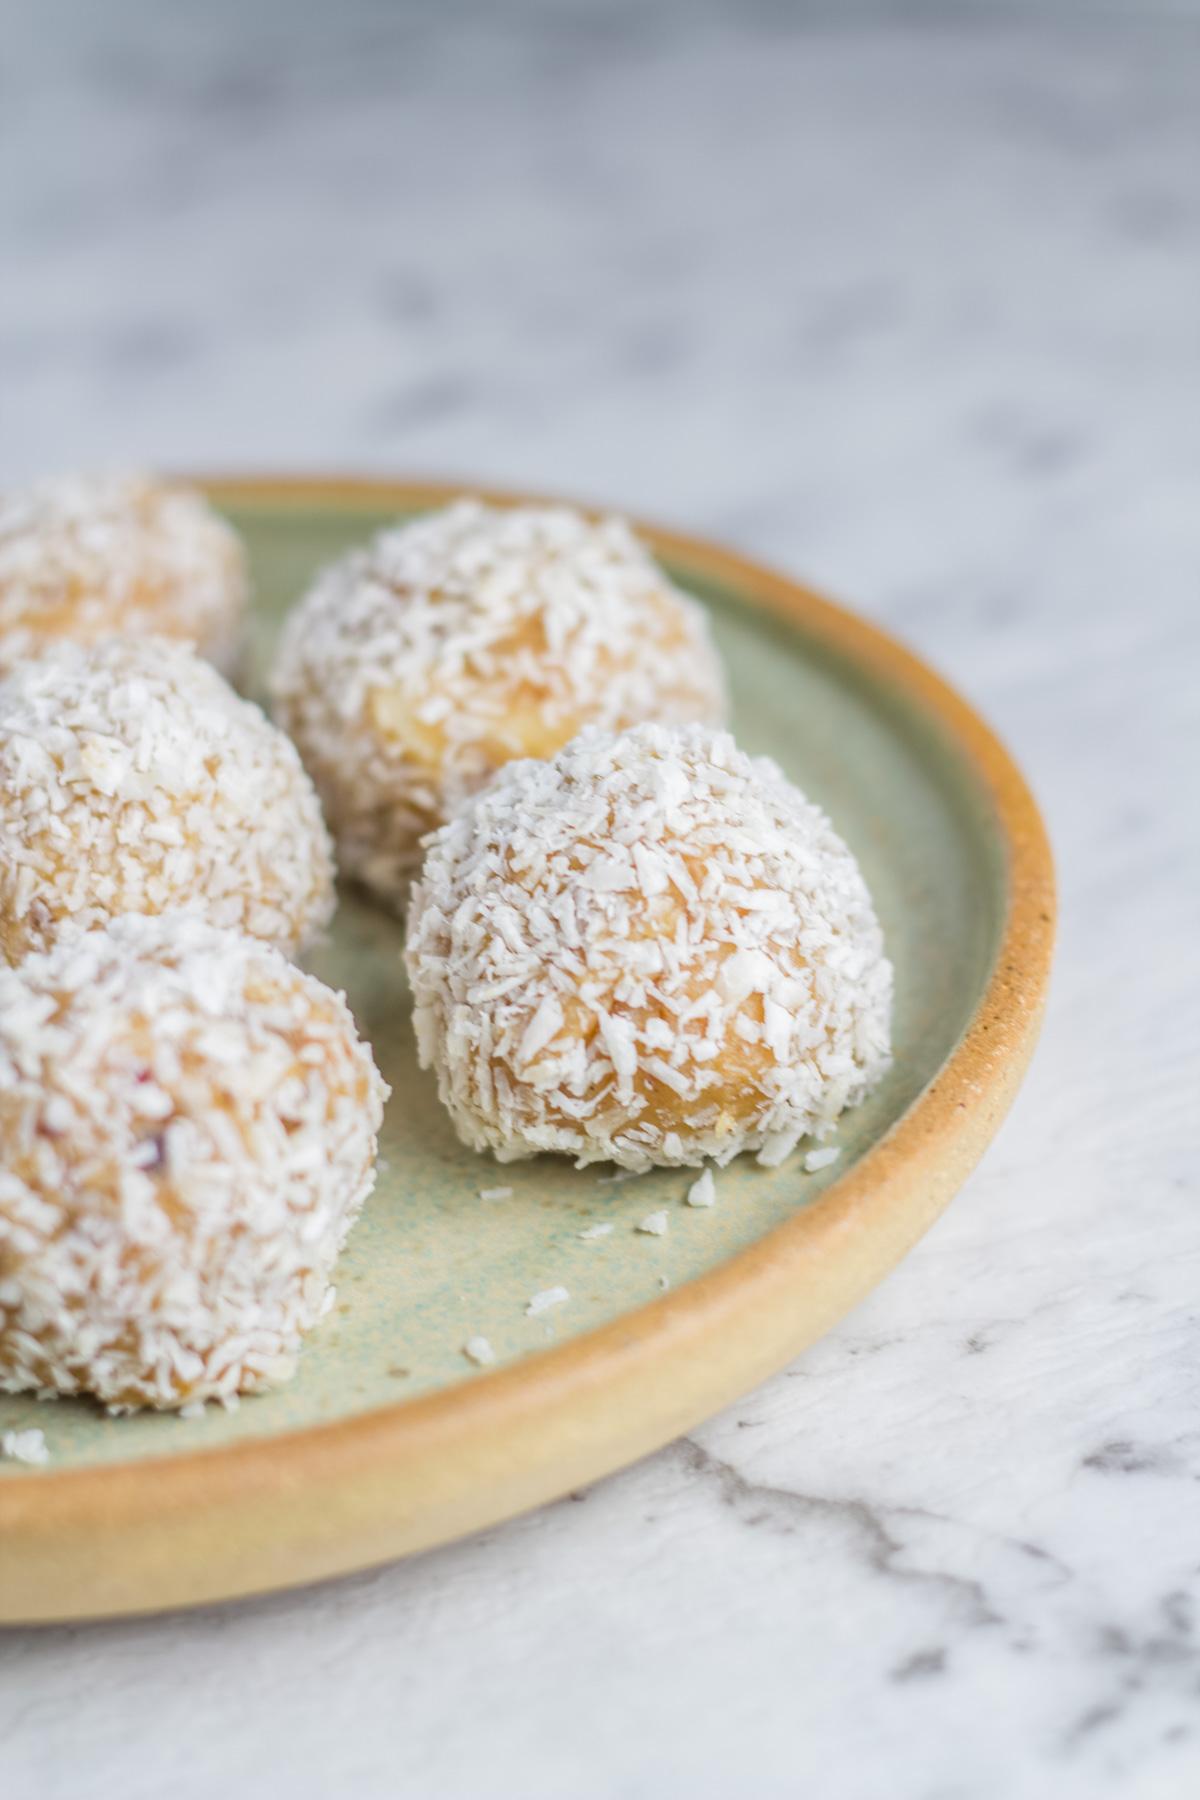 plate with raw caramel macadamia bliss balls